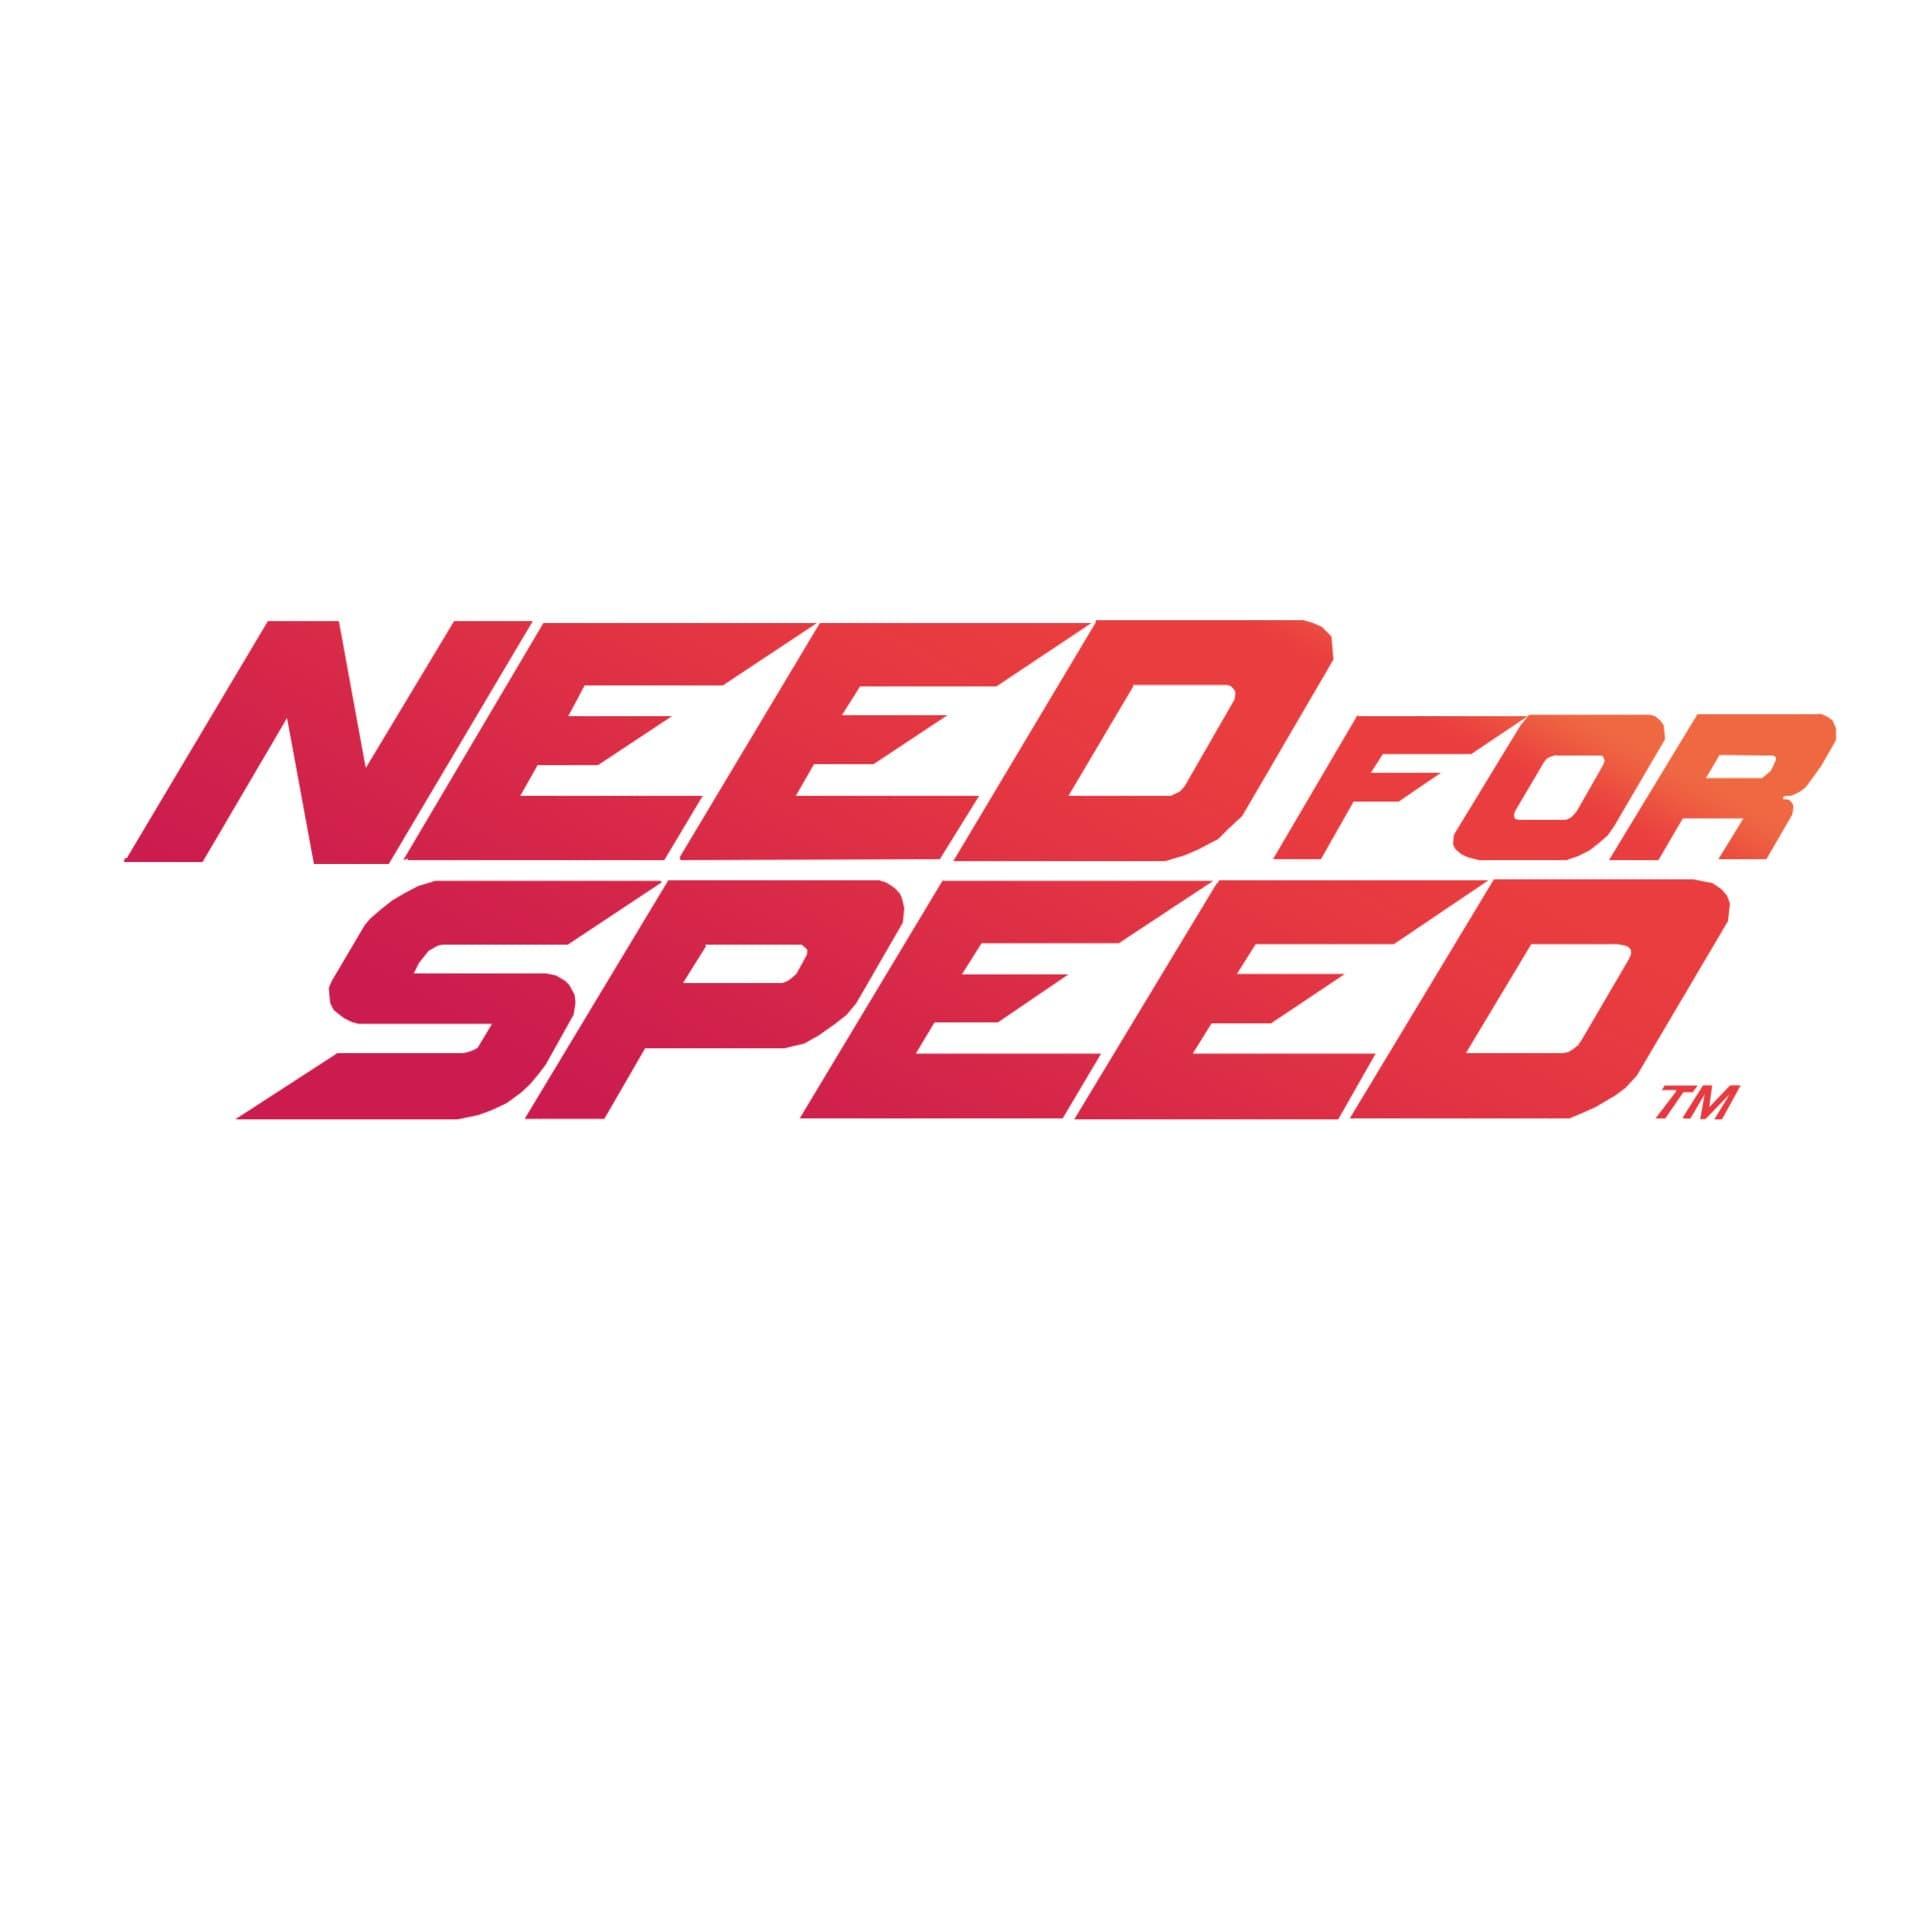 Need For Speed Logo gradiente sfondo bianco